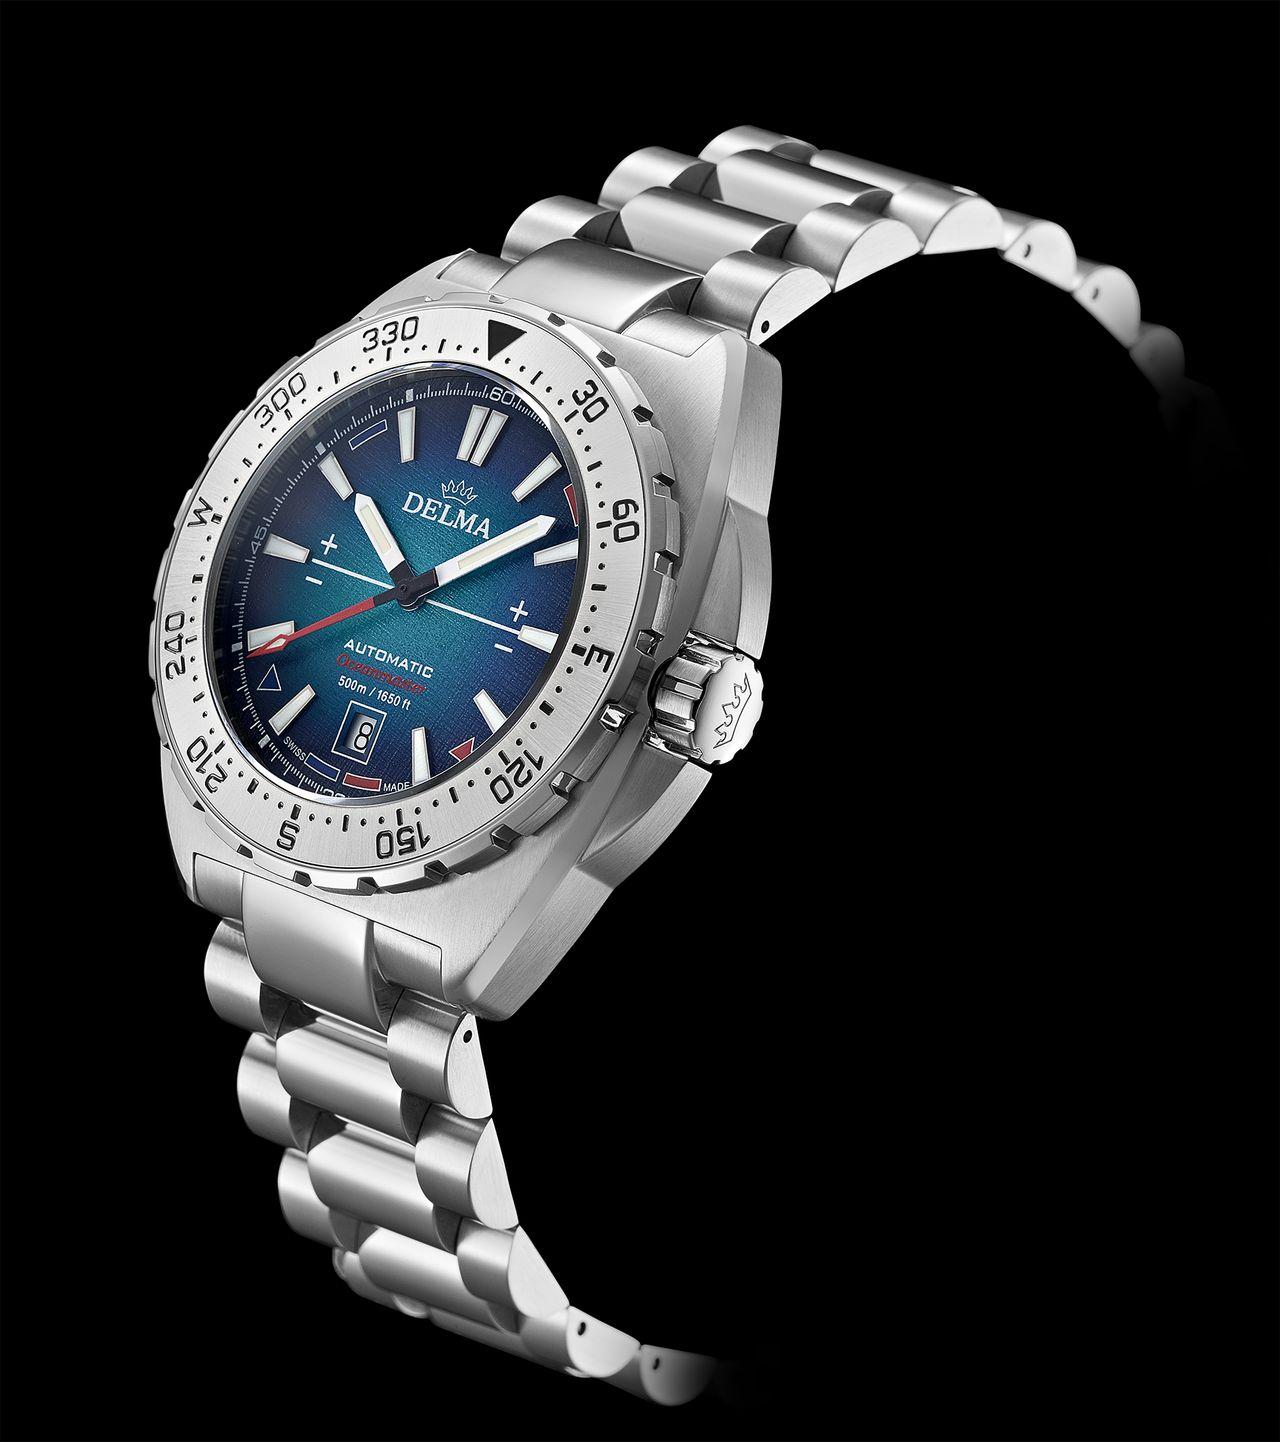 Delma Oceanmaster Antarctica Limited Edition - le sem tagadhatja a hetvenes éveket